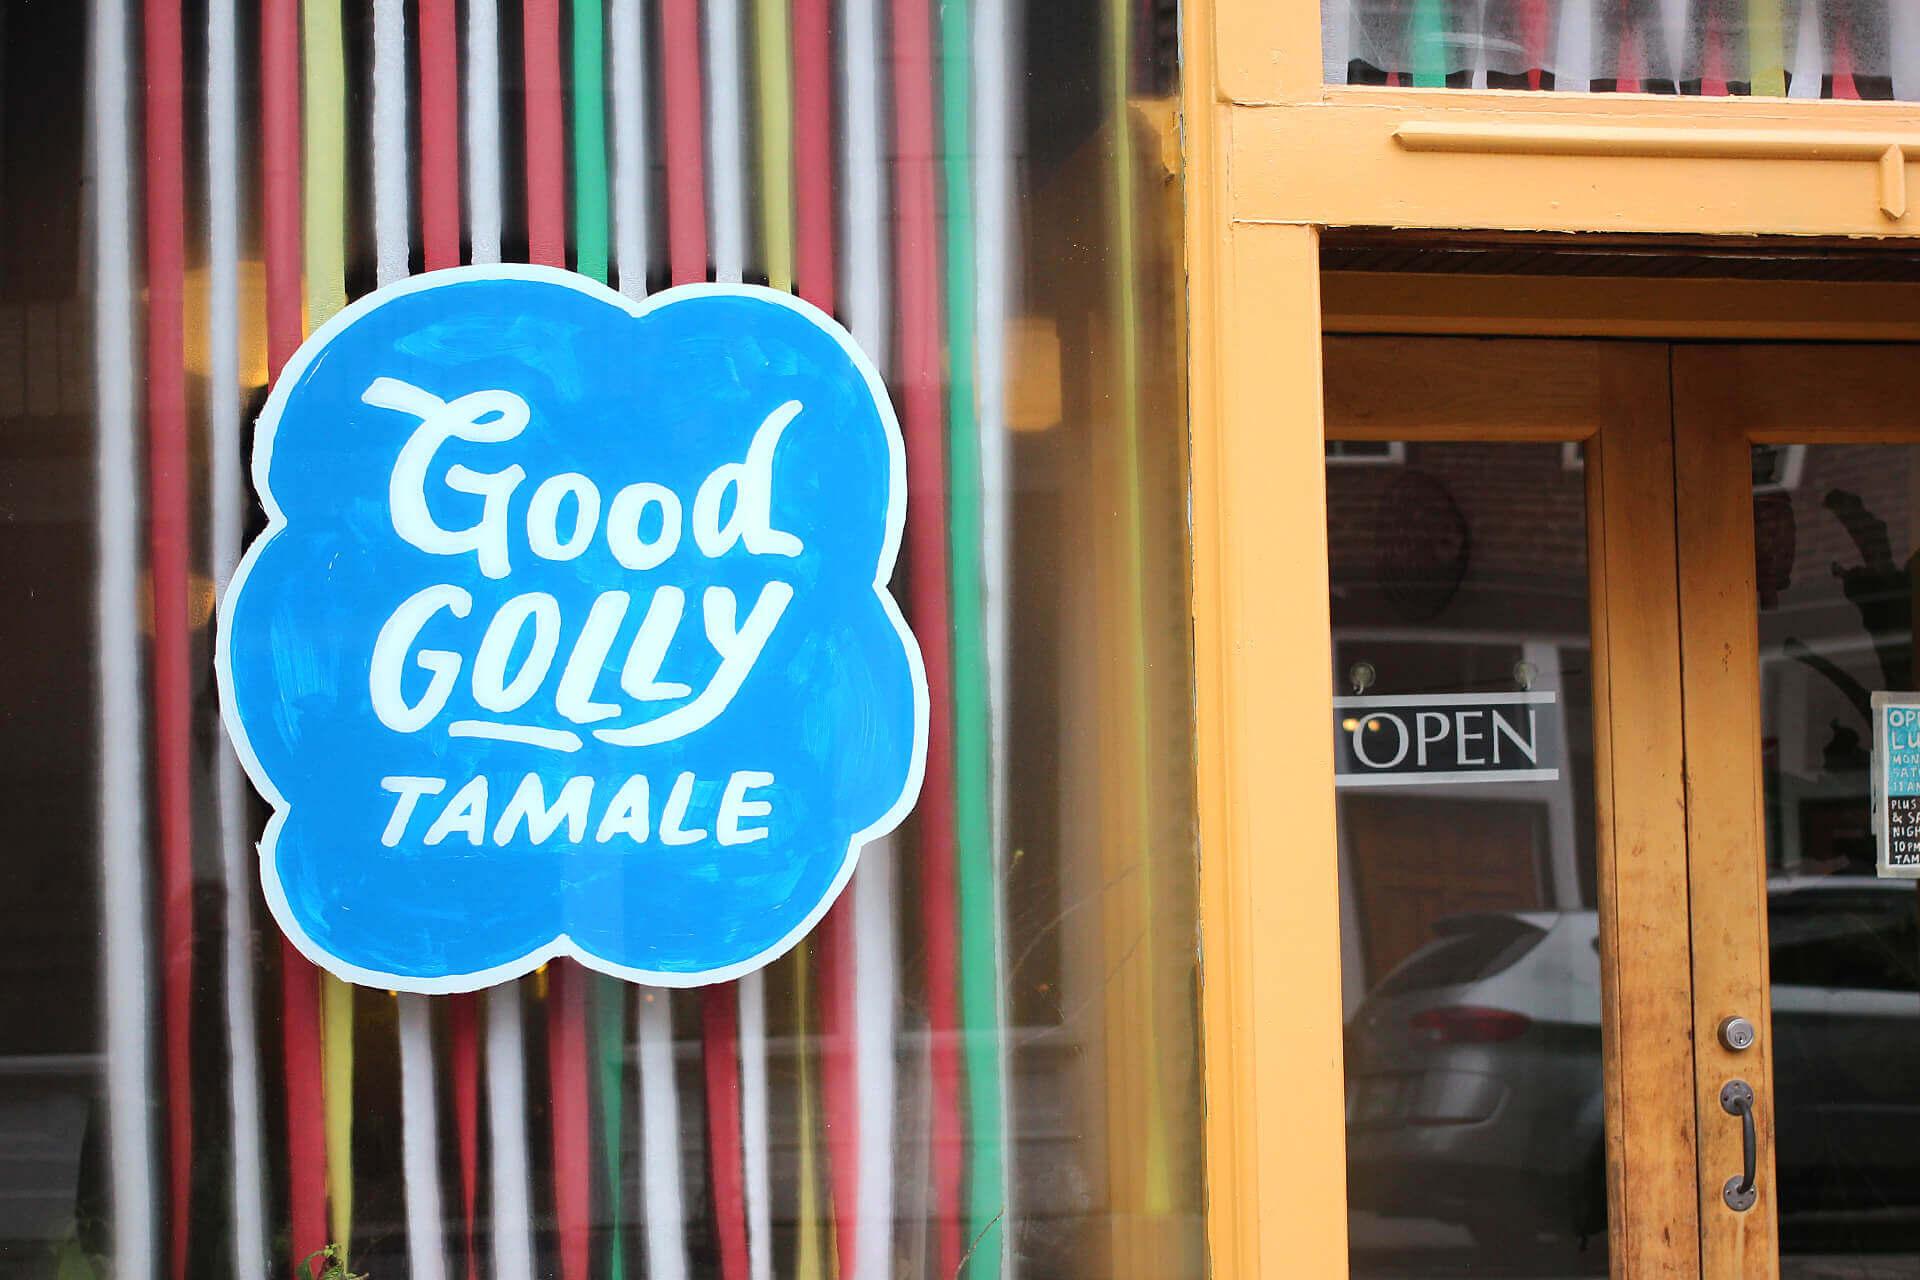 Good Golly Tamale front window art